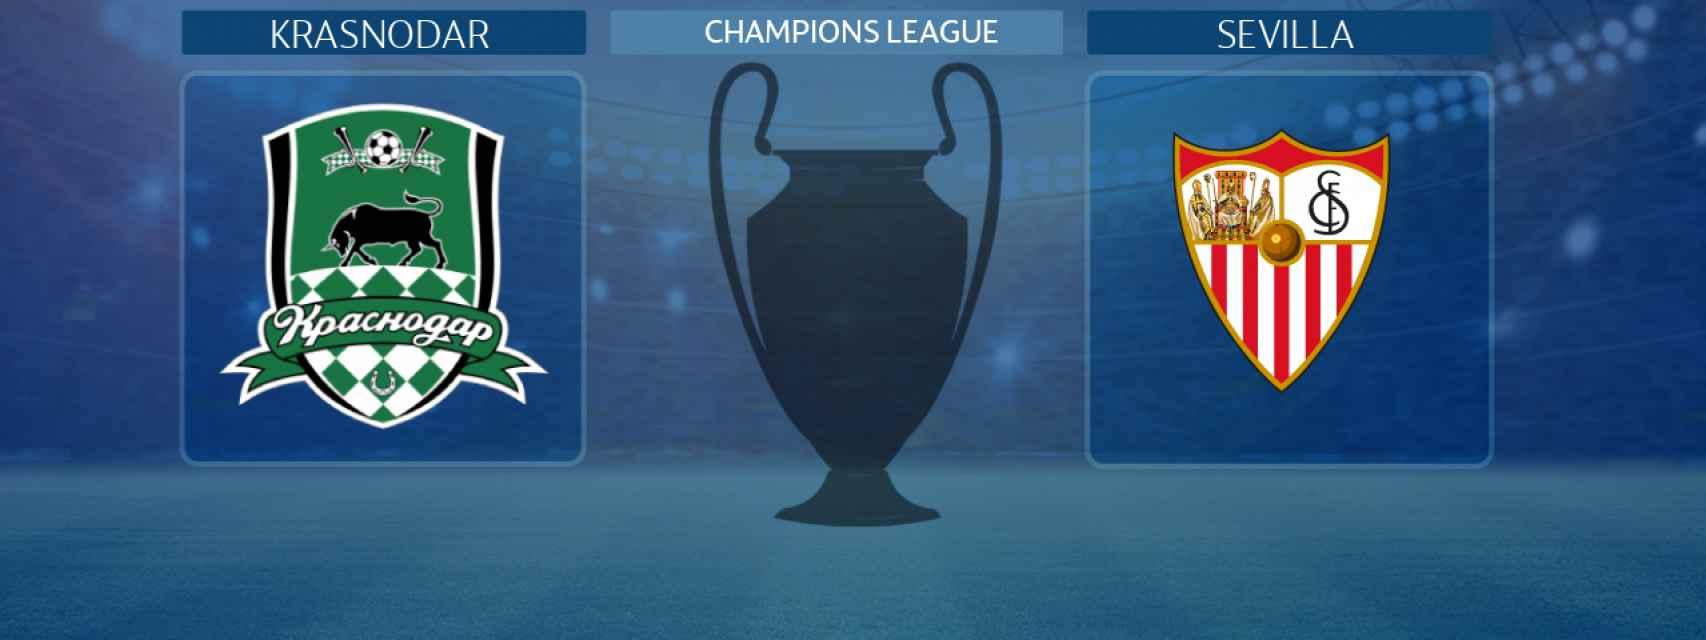 Krasnodar - Sevilla, partido de la Champions League